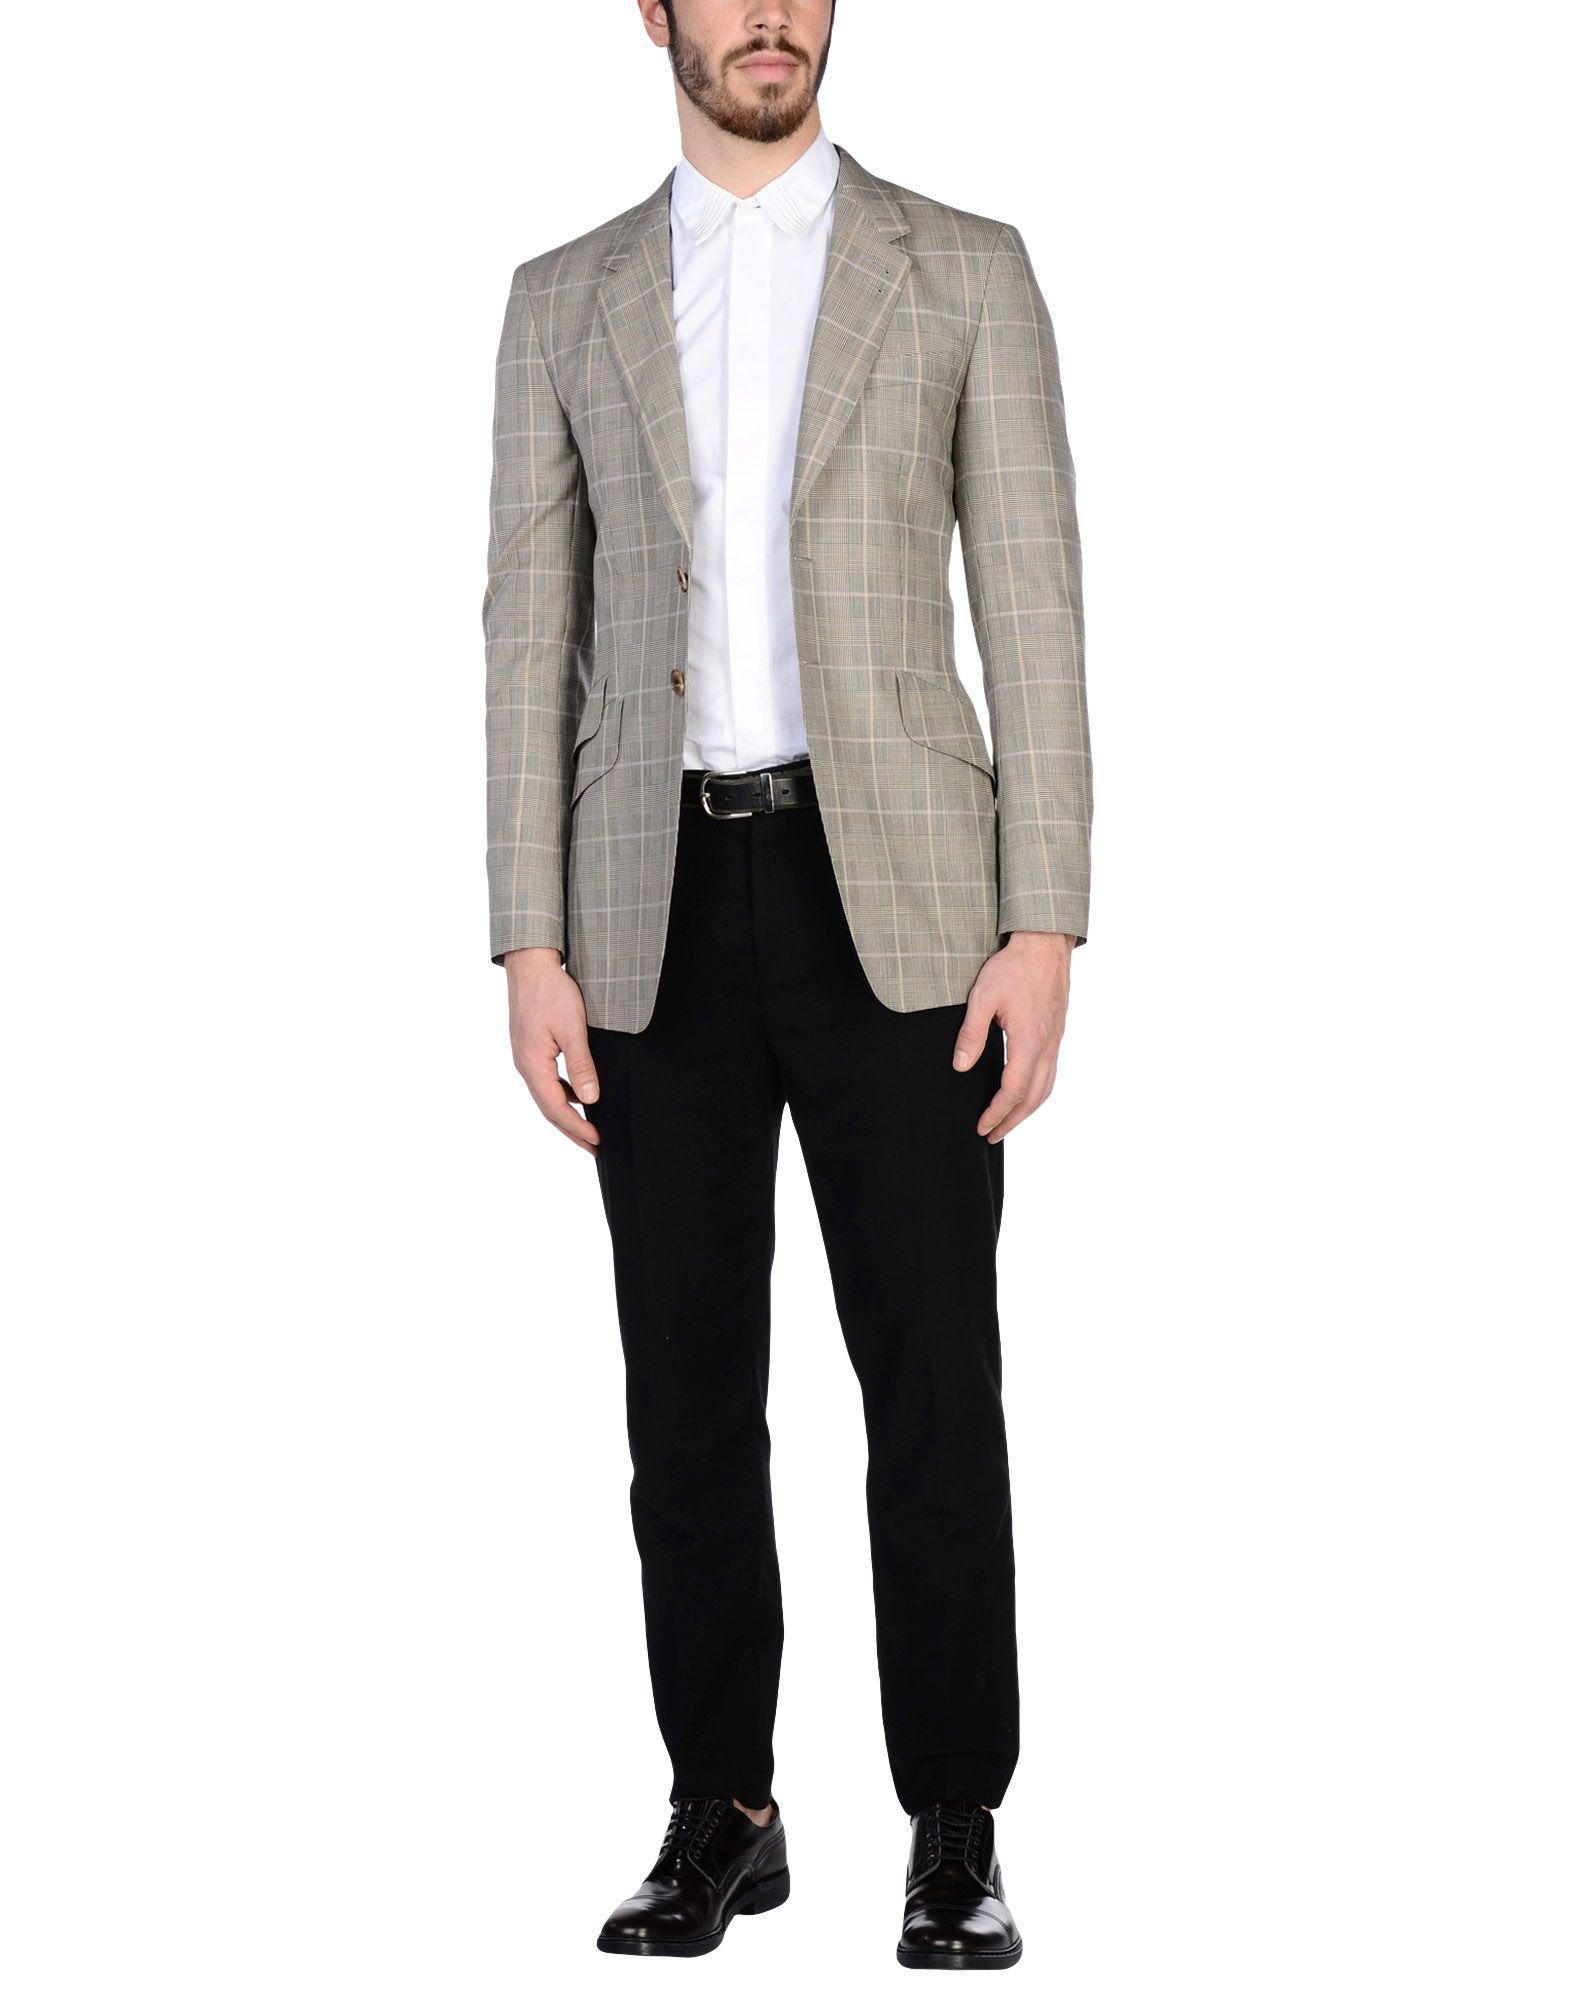 Paul Smith Wool Blazer in Beige (Natural) for Men